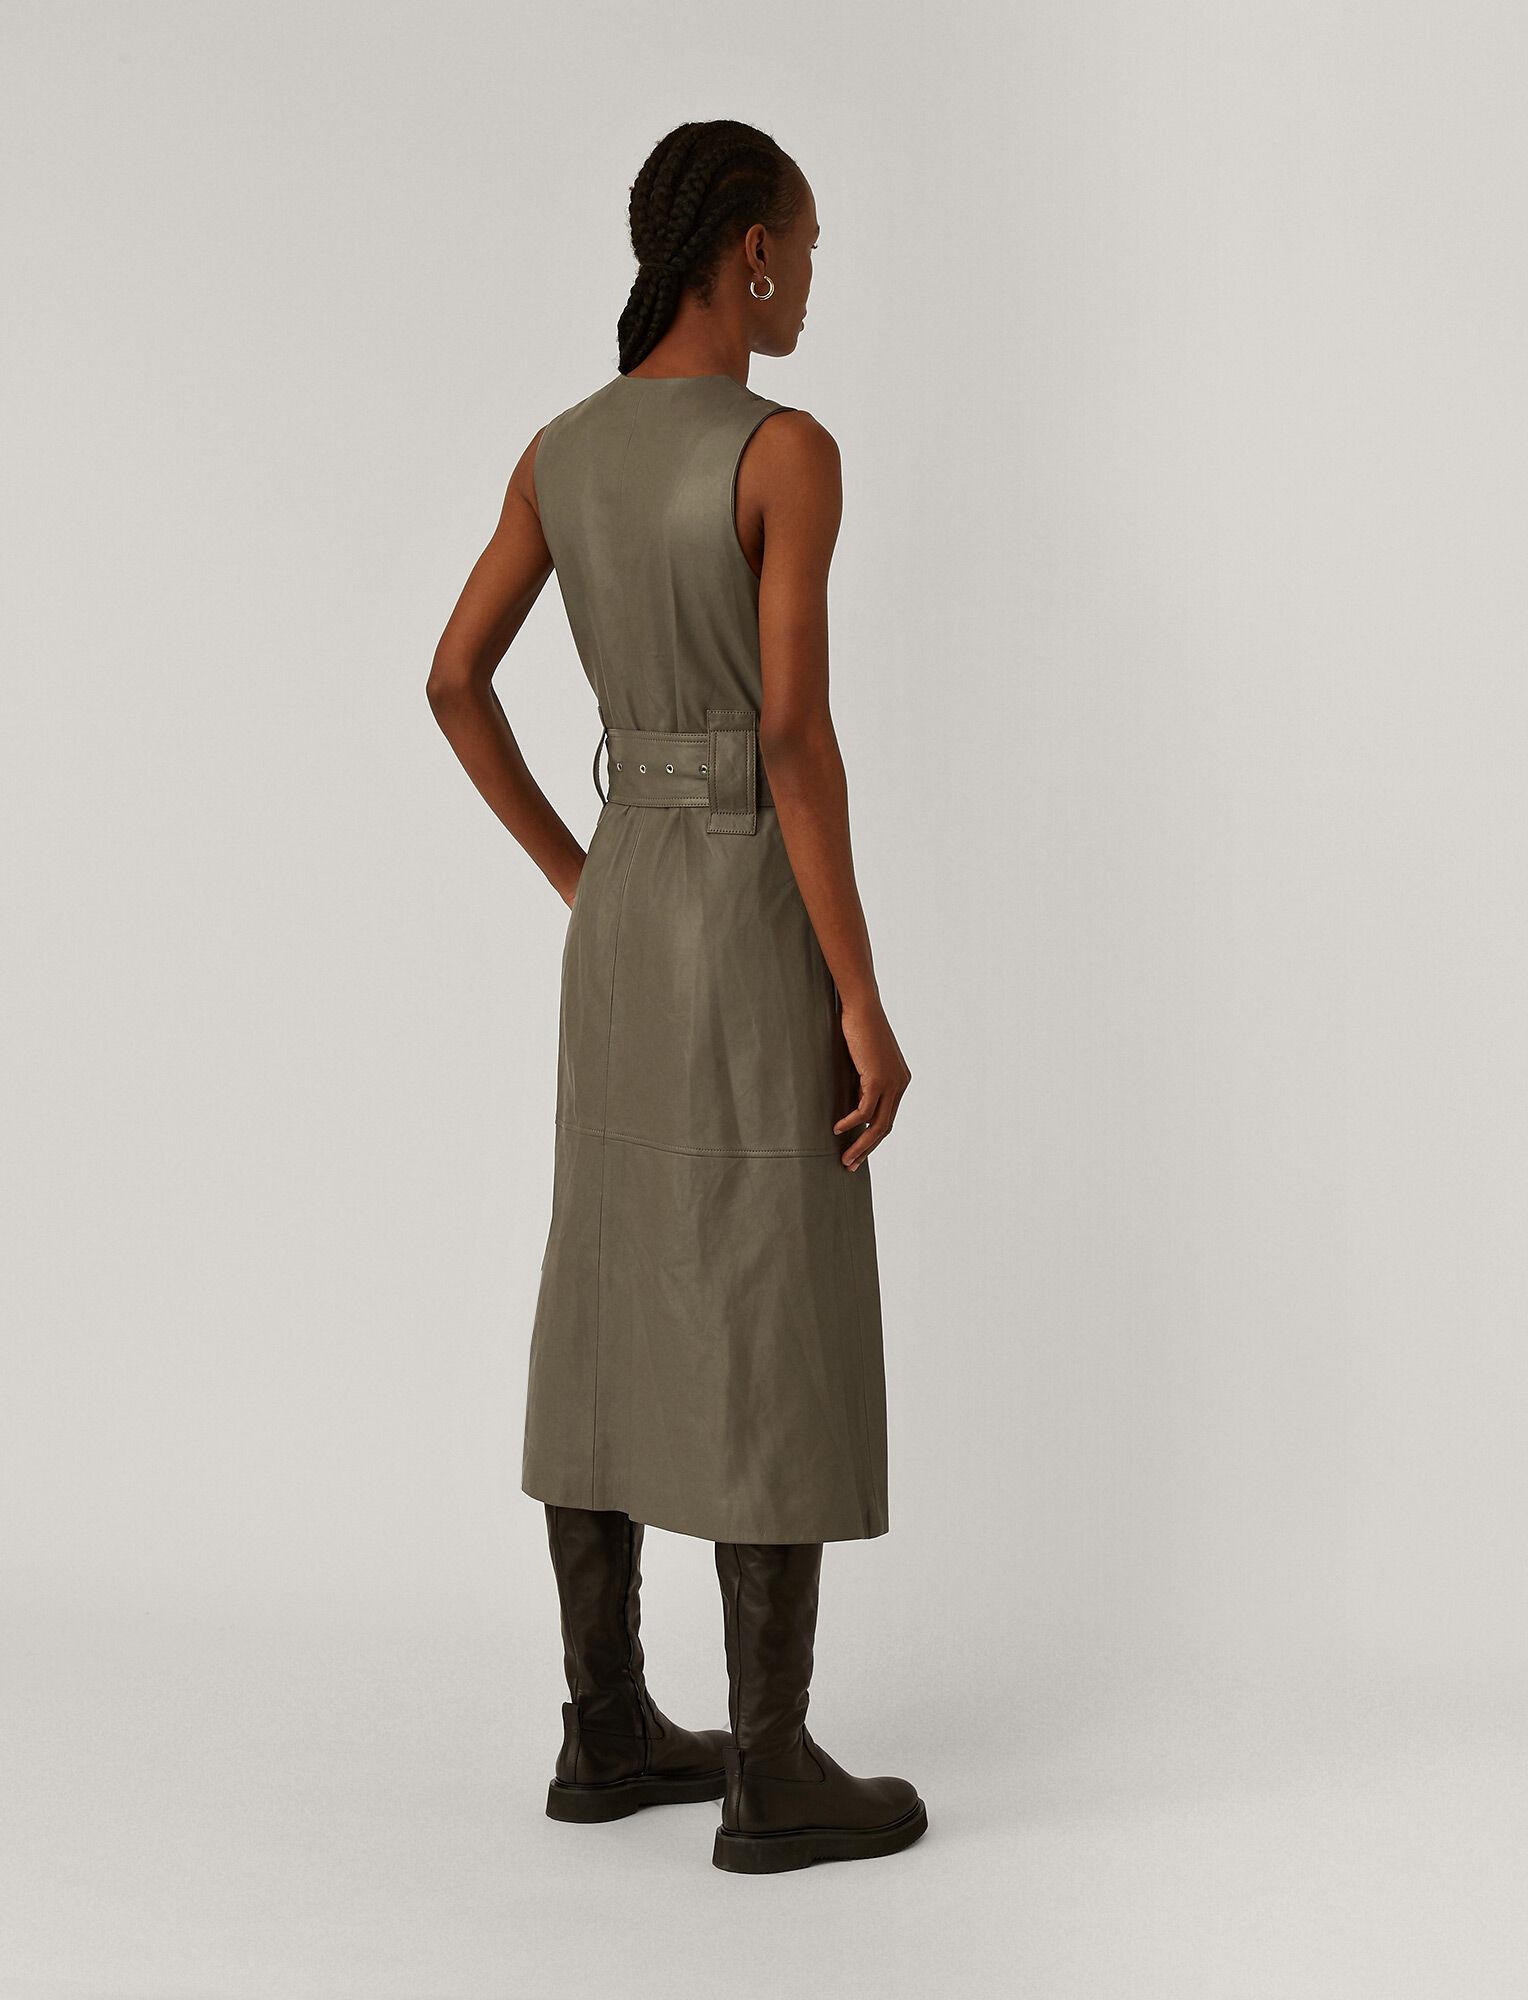 Joseph, Dibo Nappa Leather Dress, in Ash